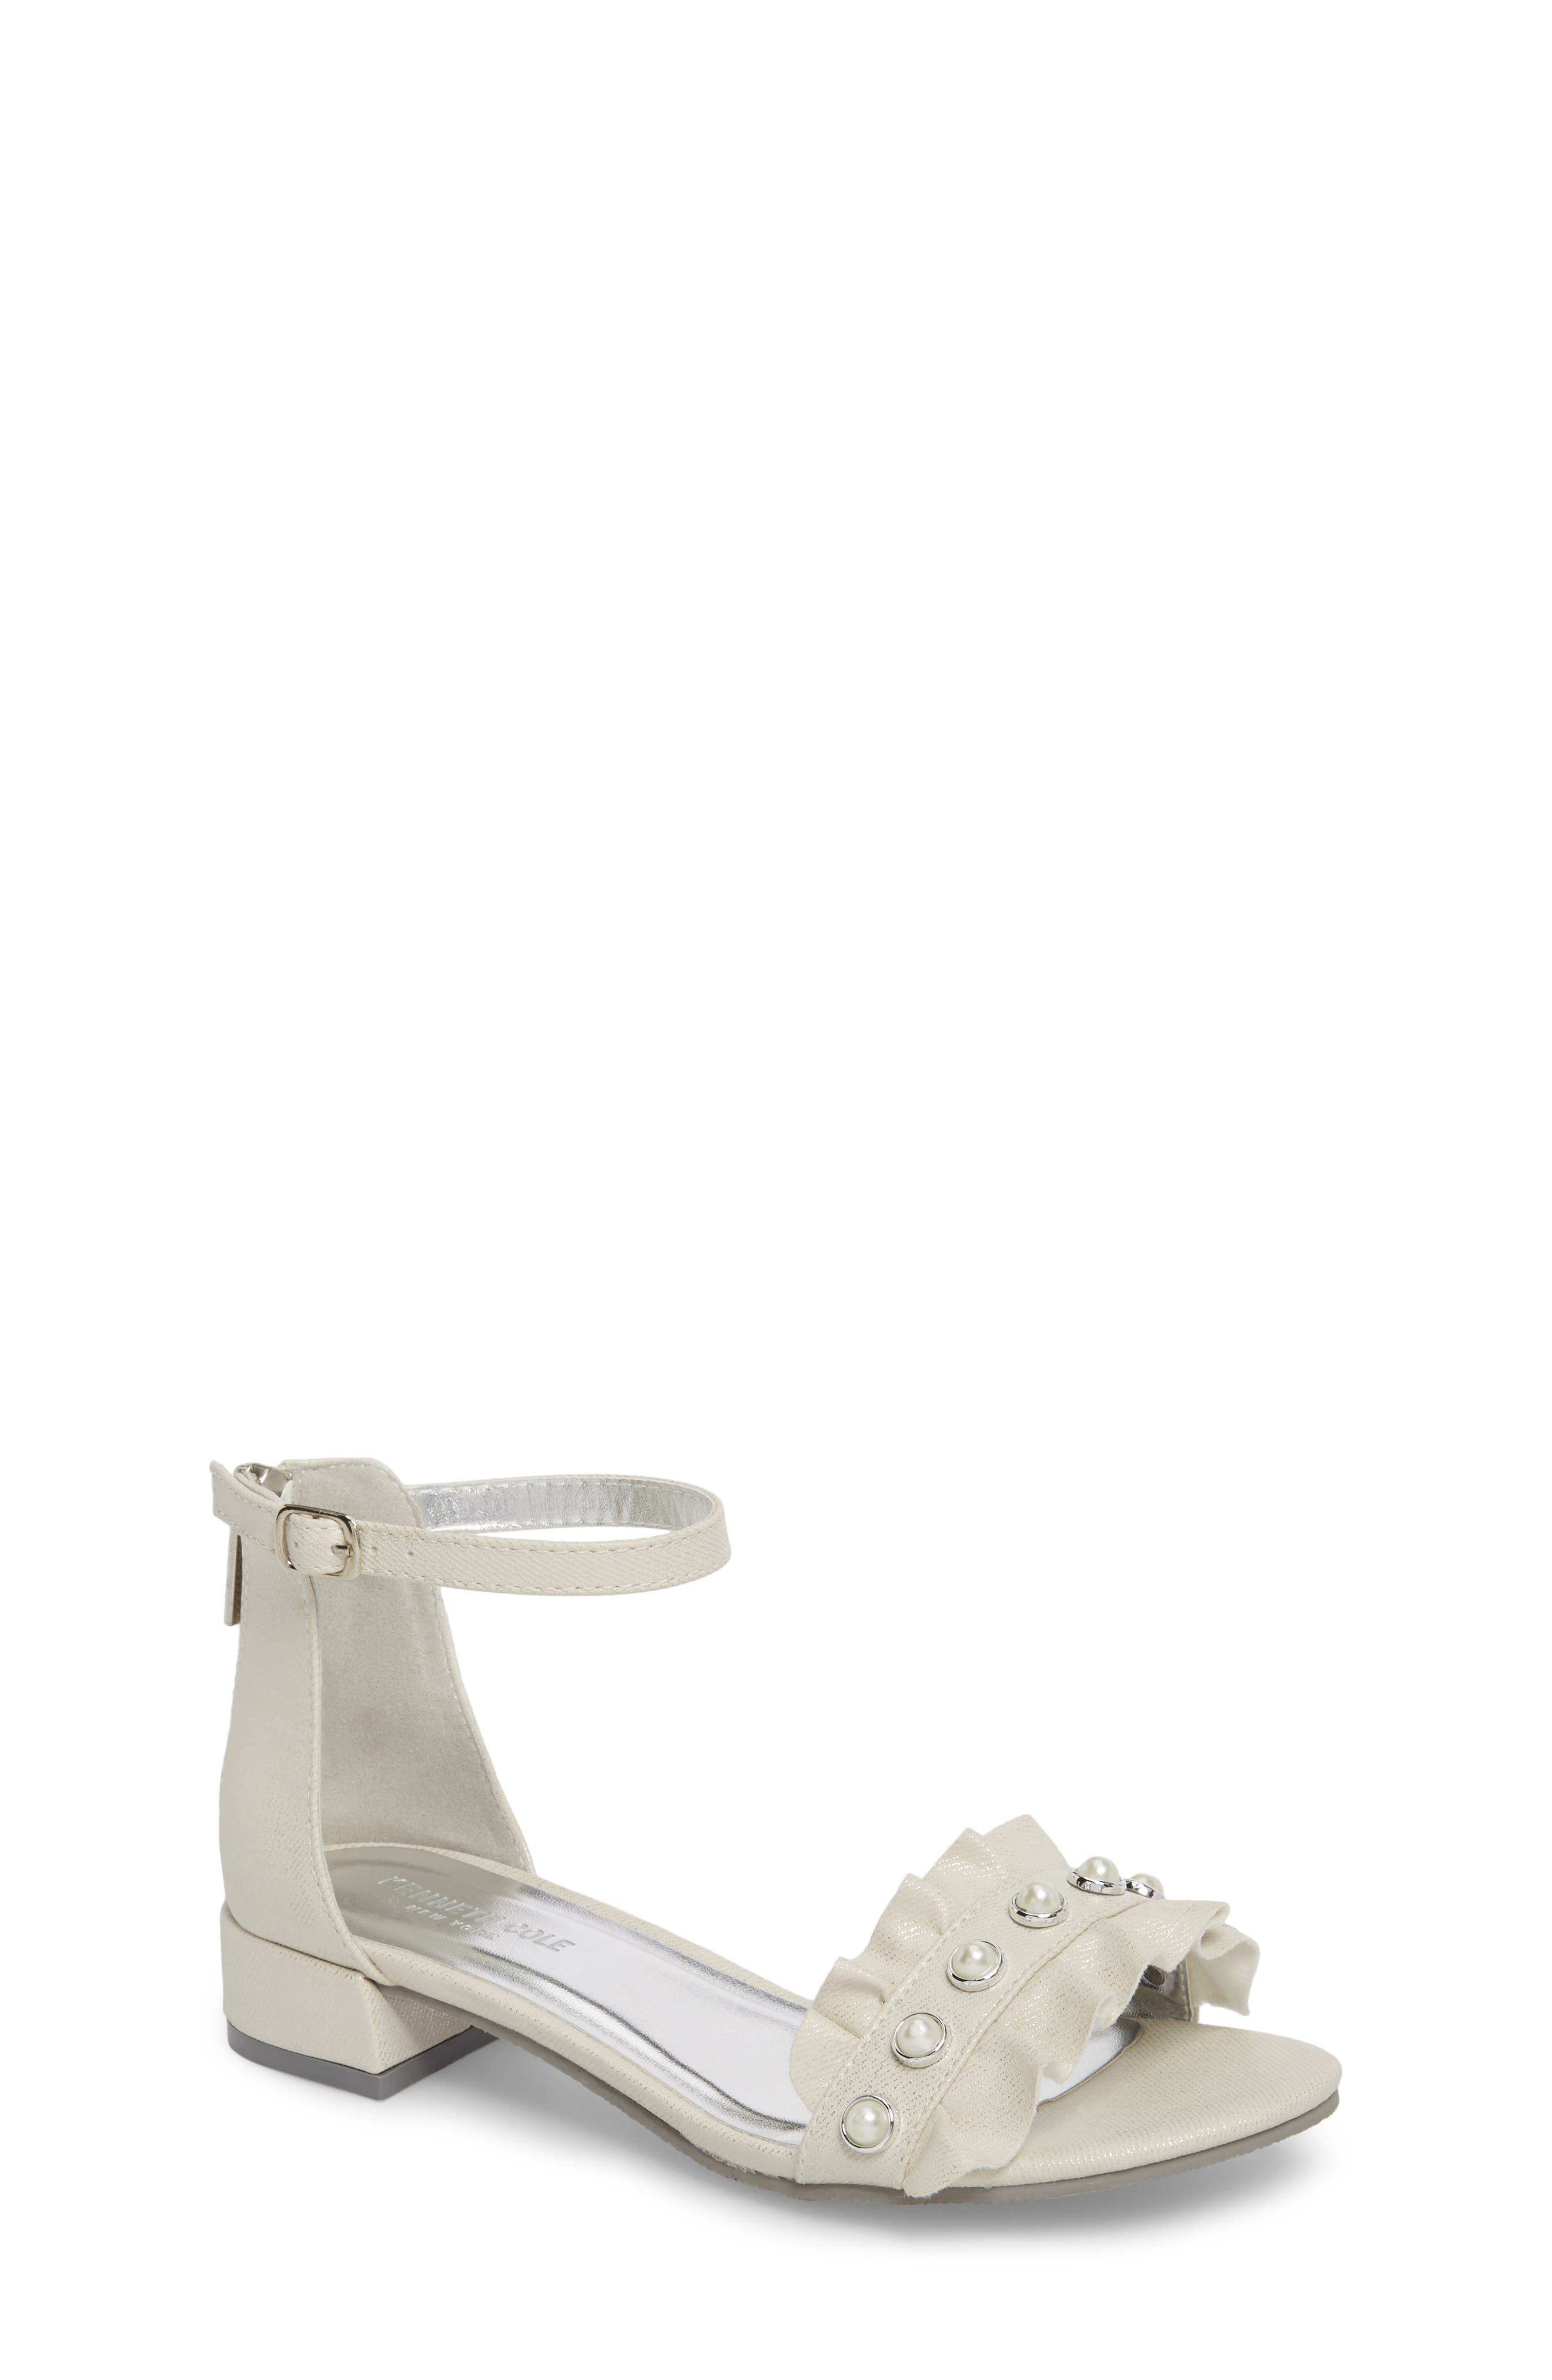 Reaction Kenneth Cole Julie Ruffle Sandal,                         Main,                         color, WHITE